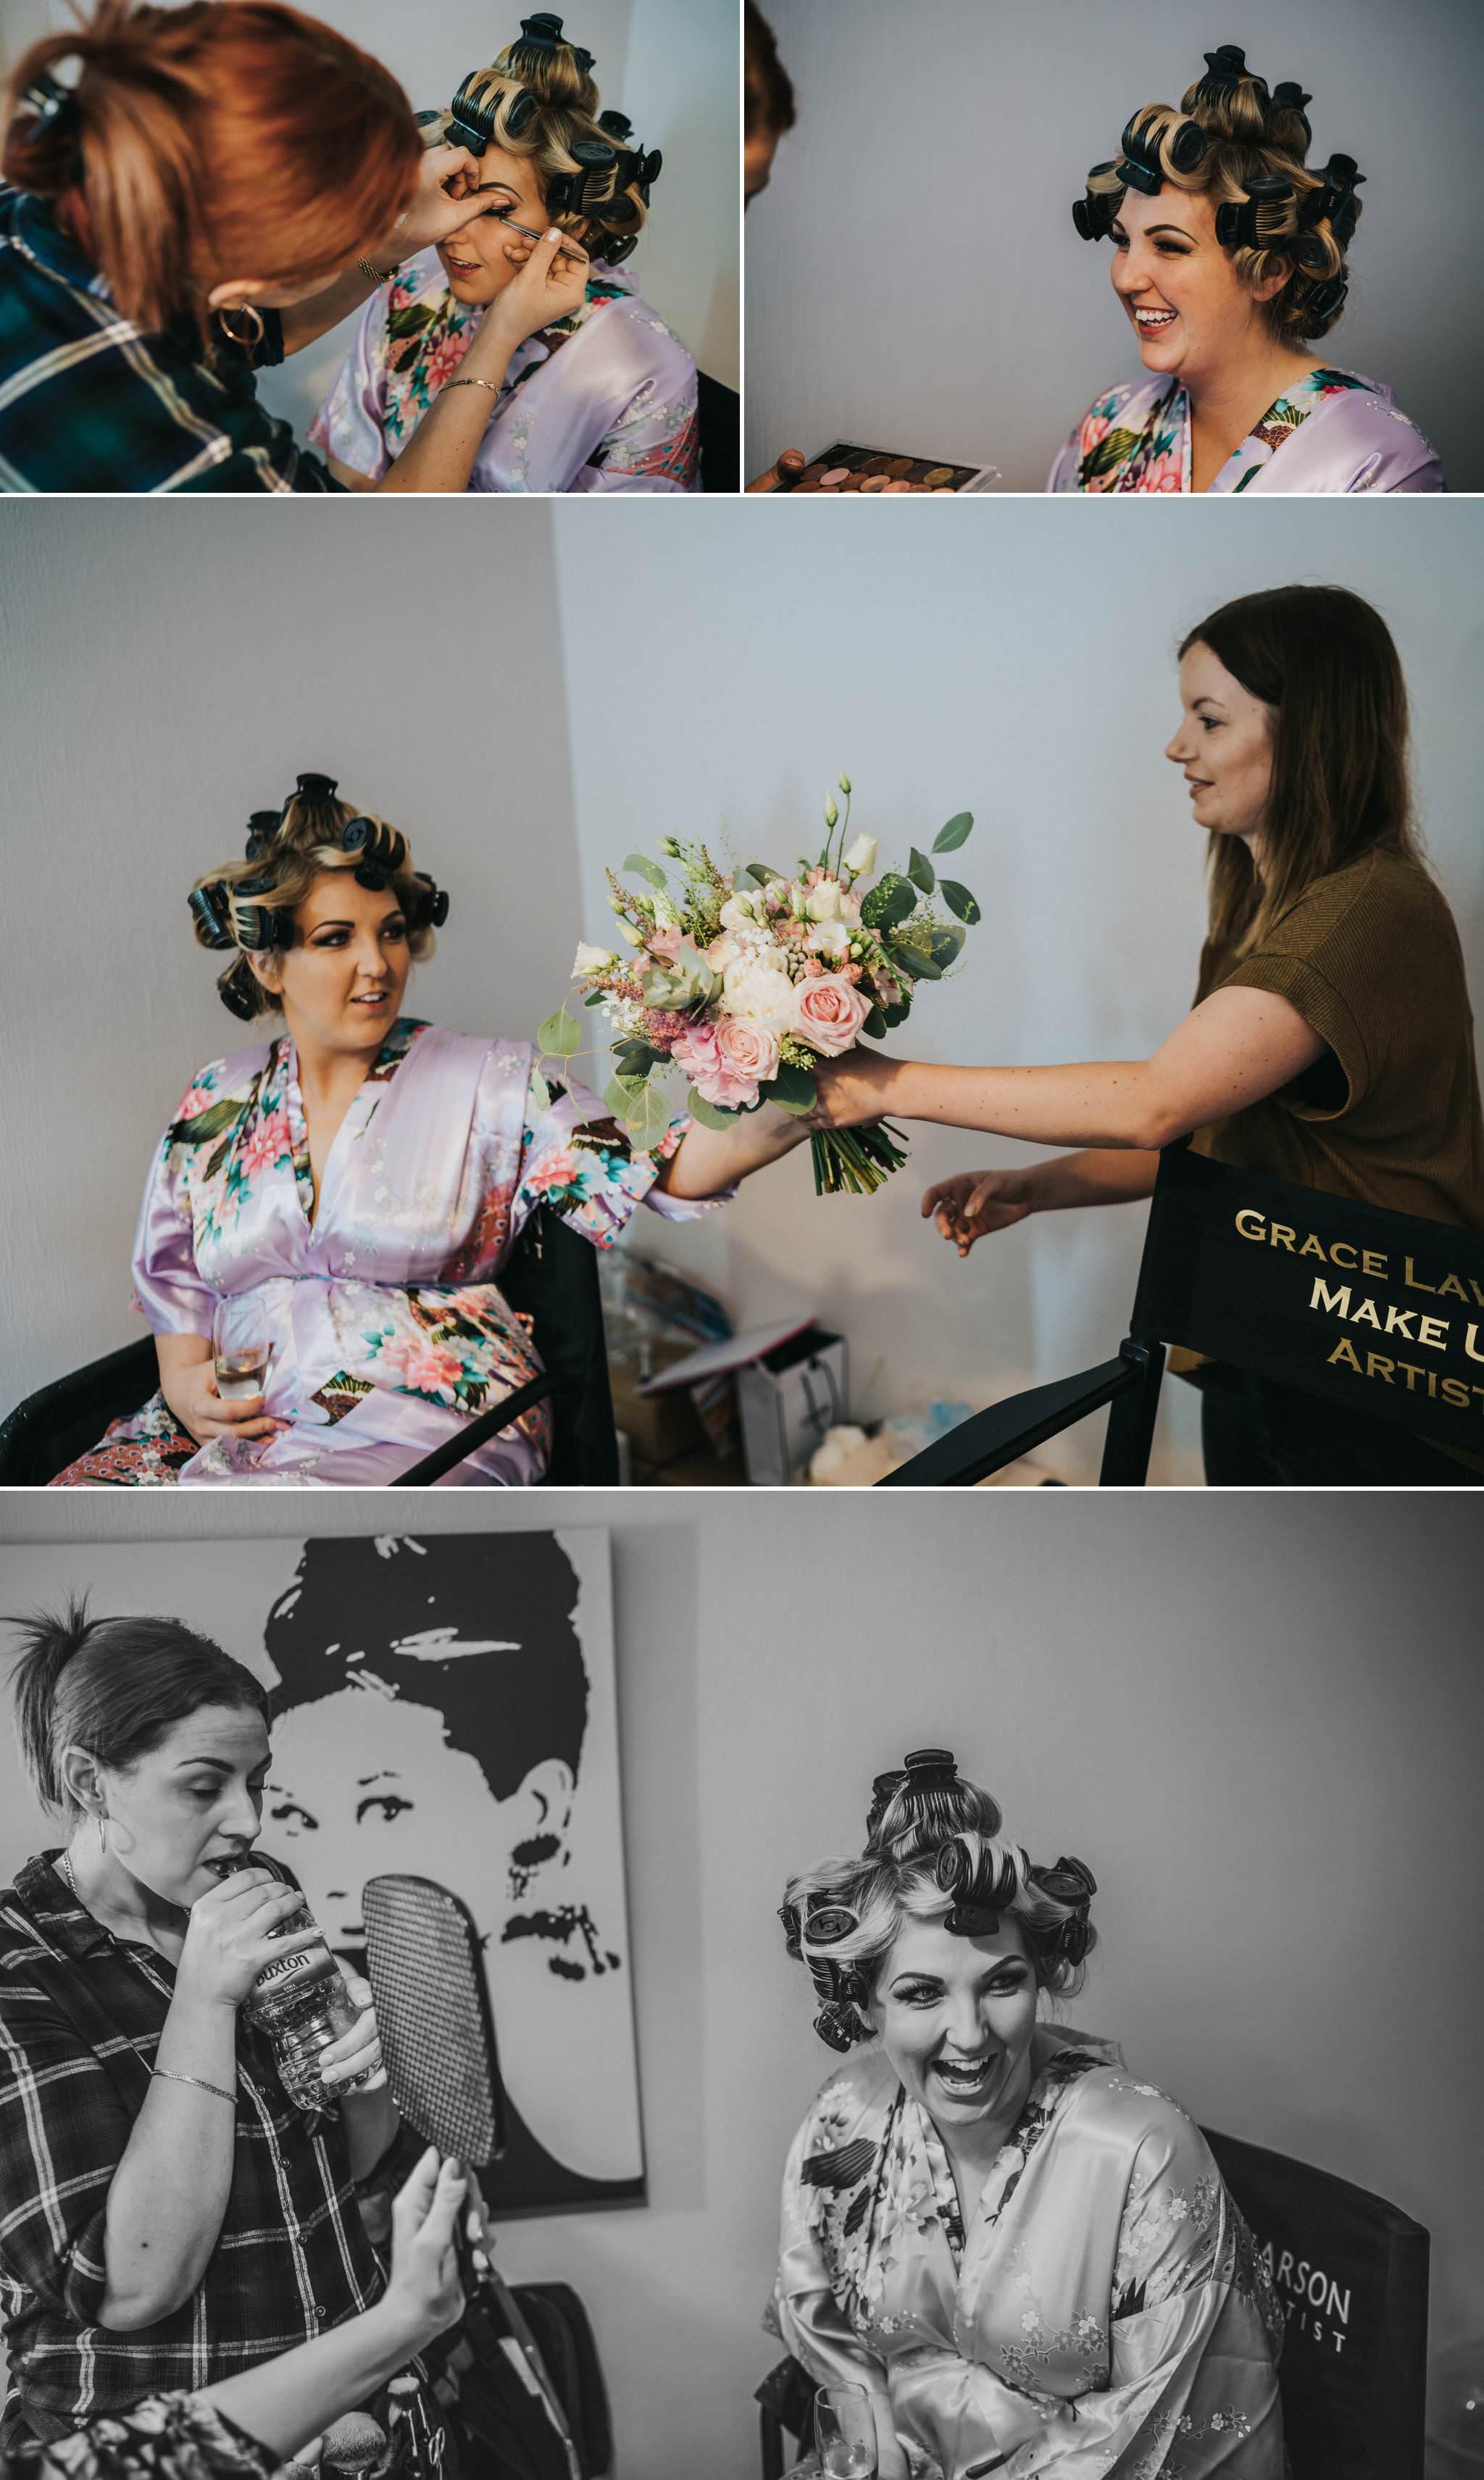 somerford-hall-wedding-photography 1.jpg